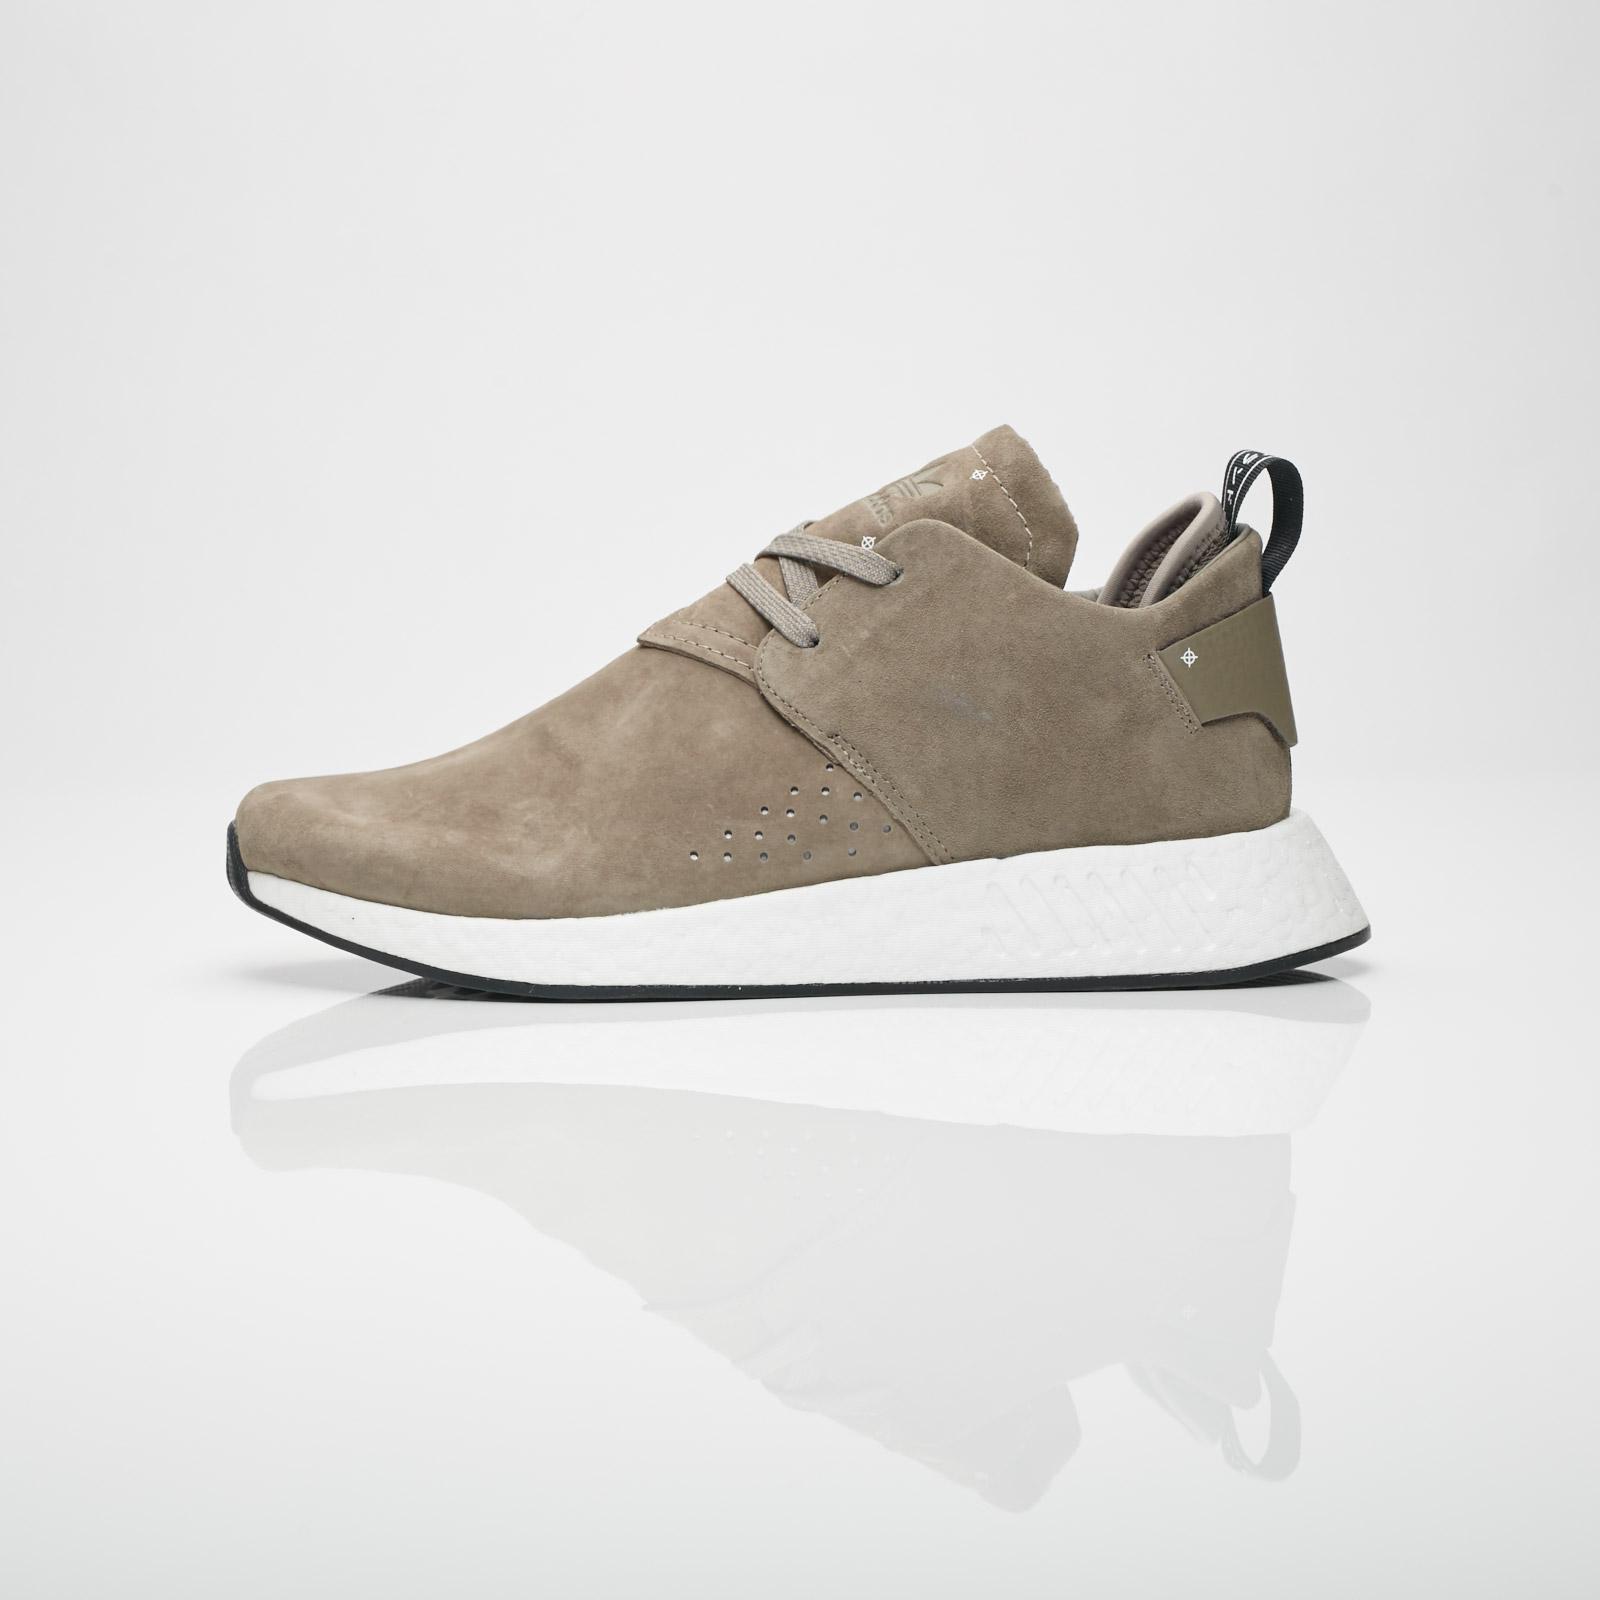 Adidas NMD köp